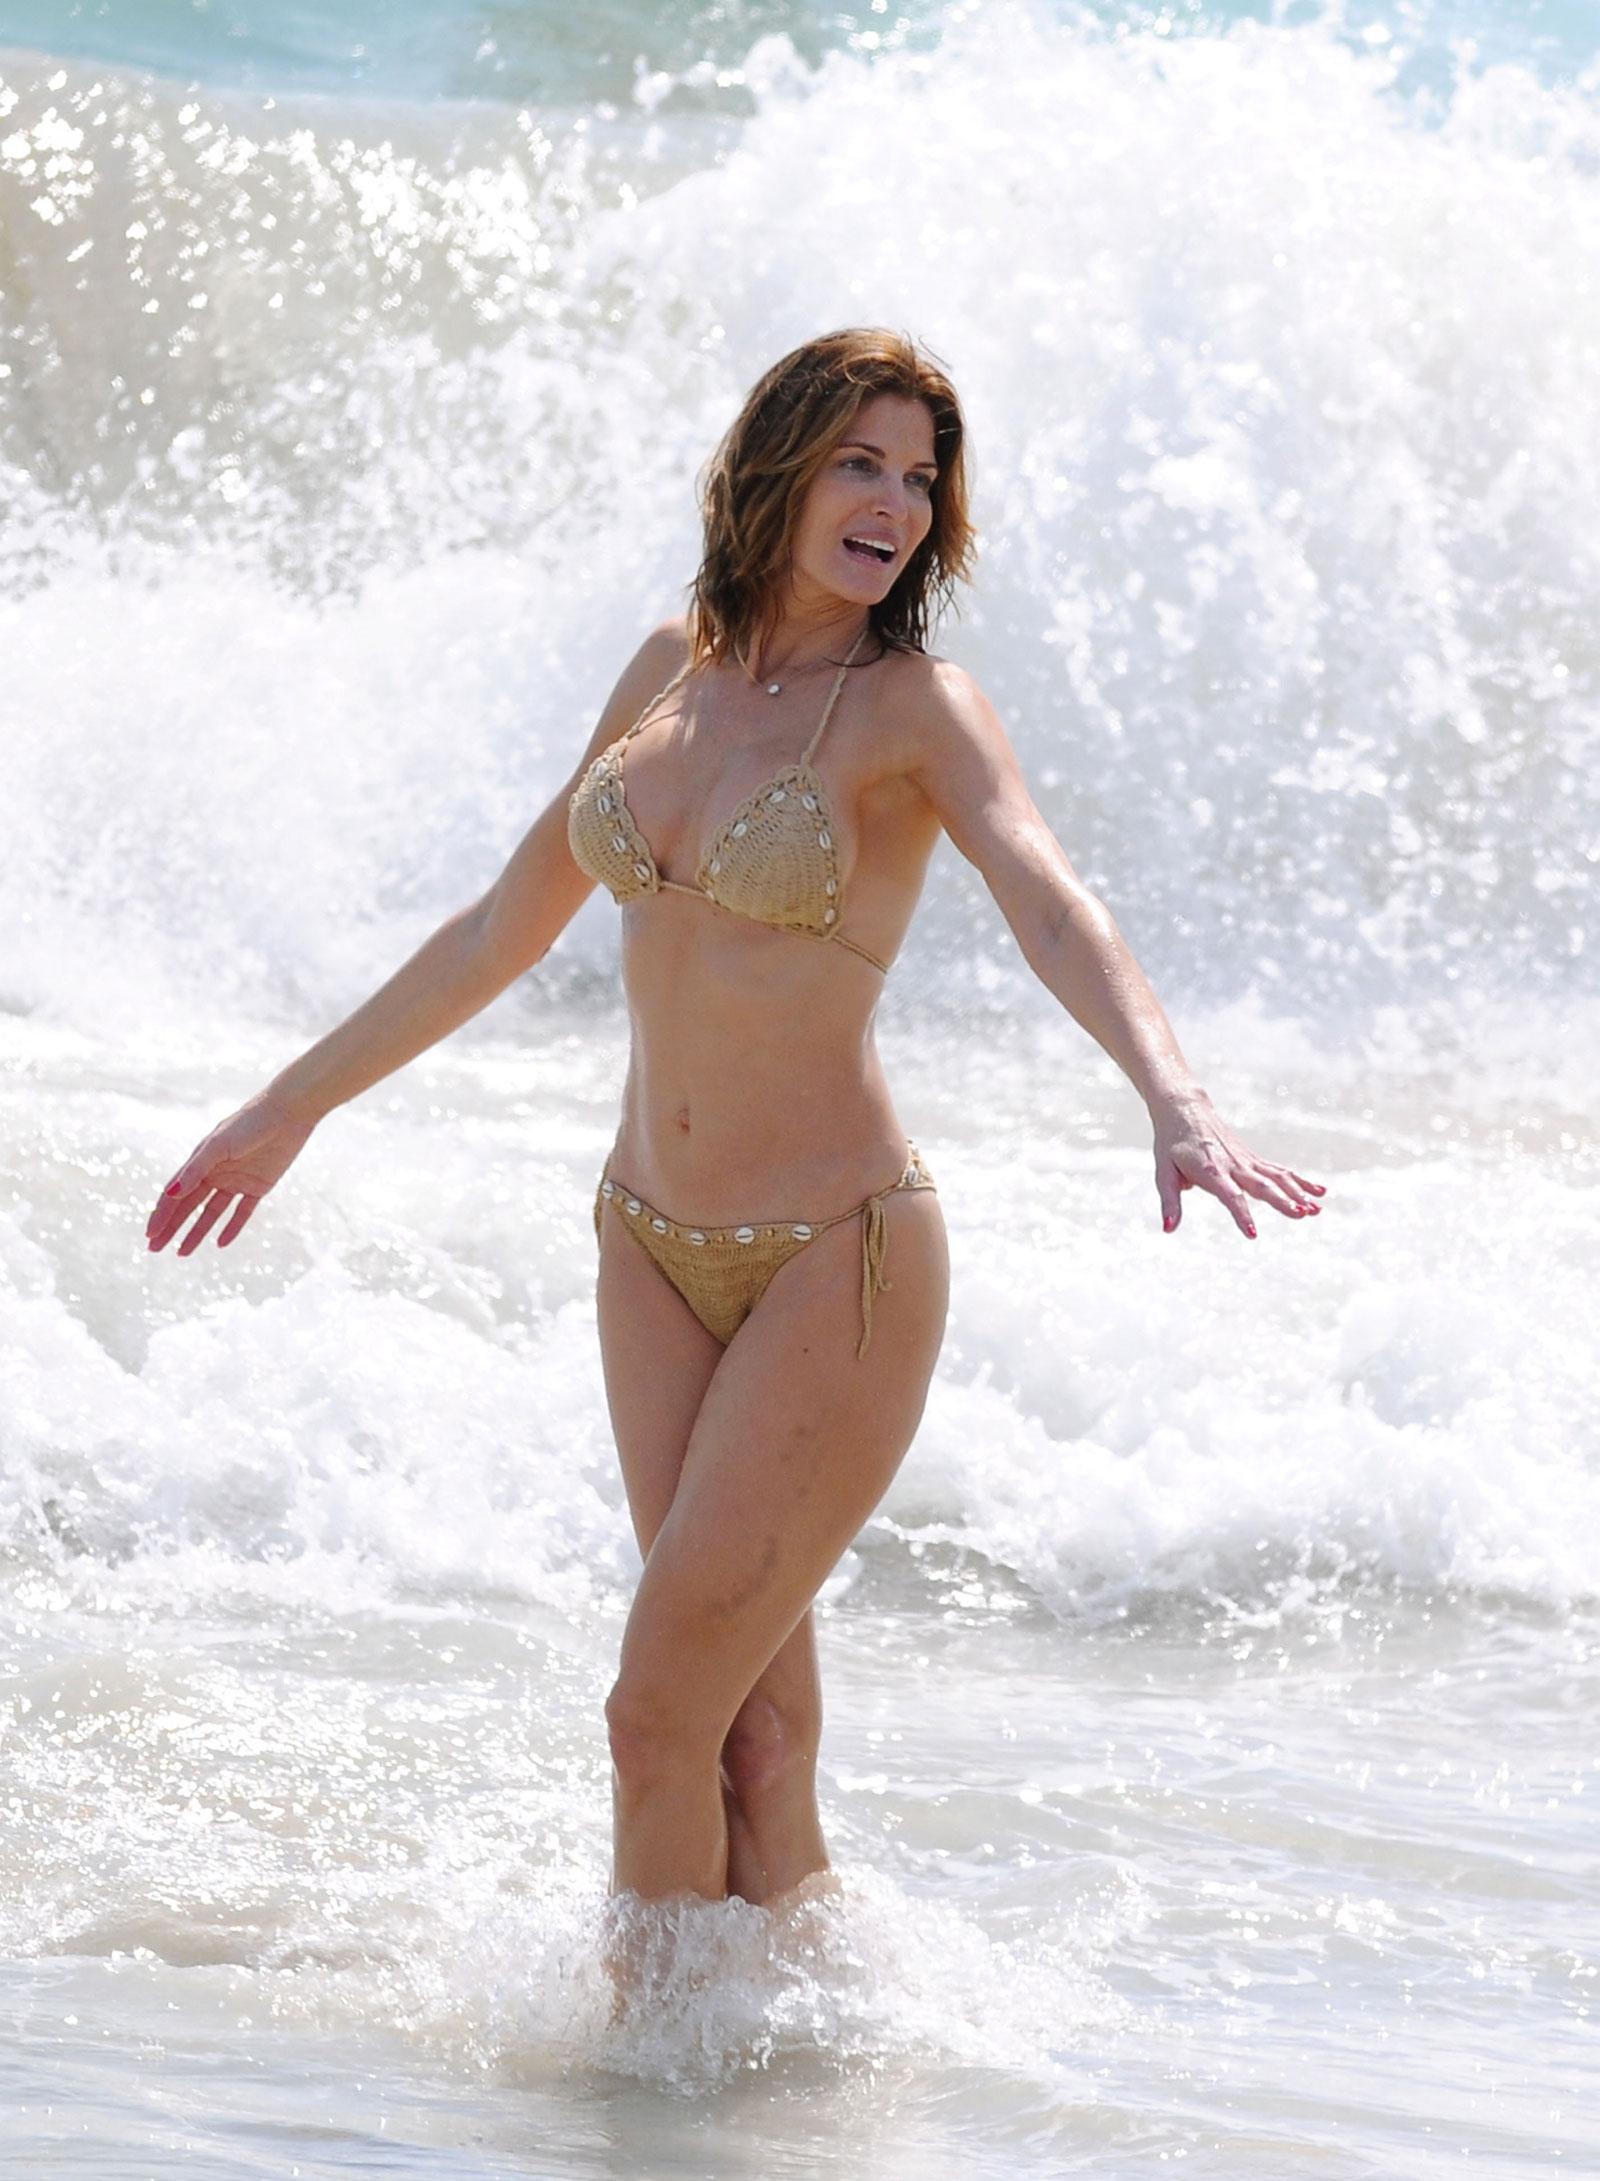 Stephanie Seymour In Bikini On The Beach At St Barts